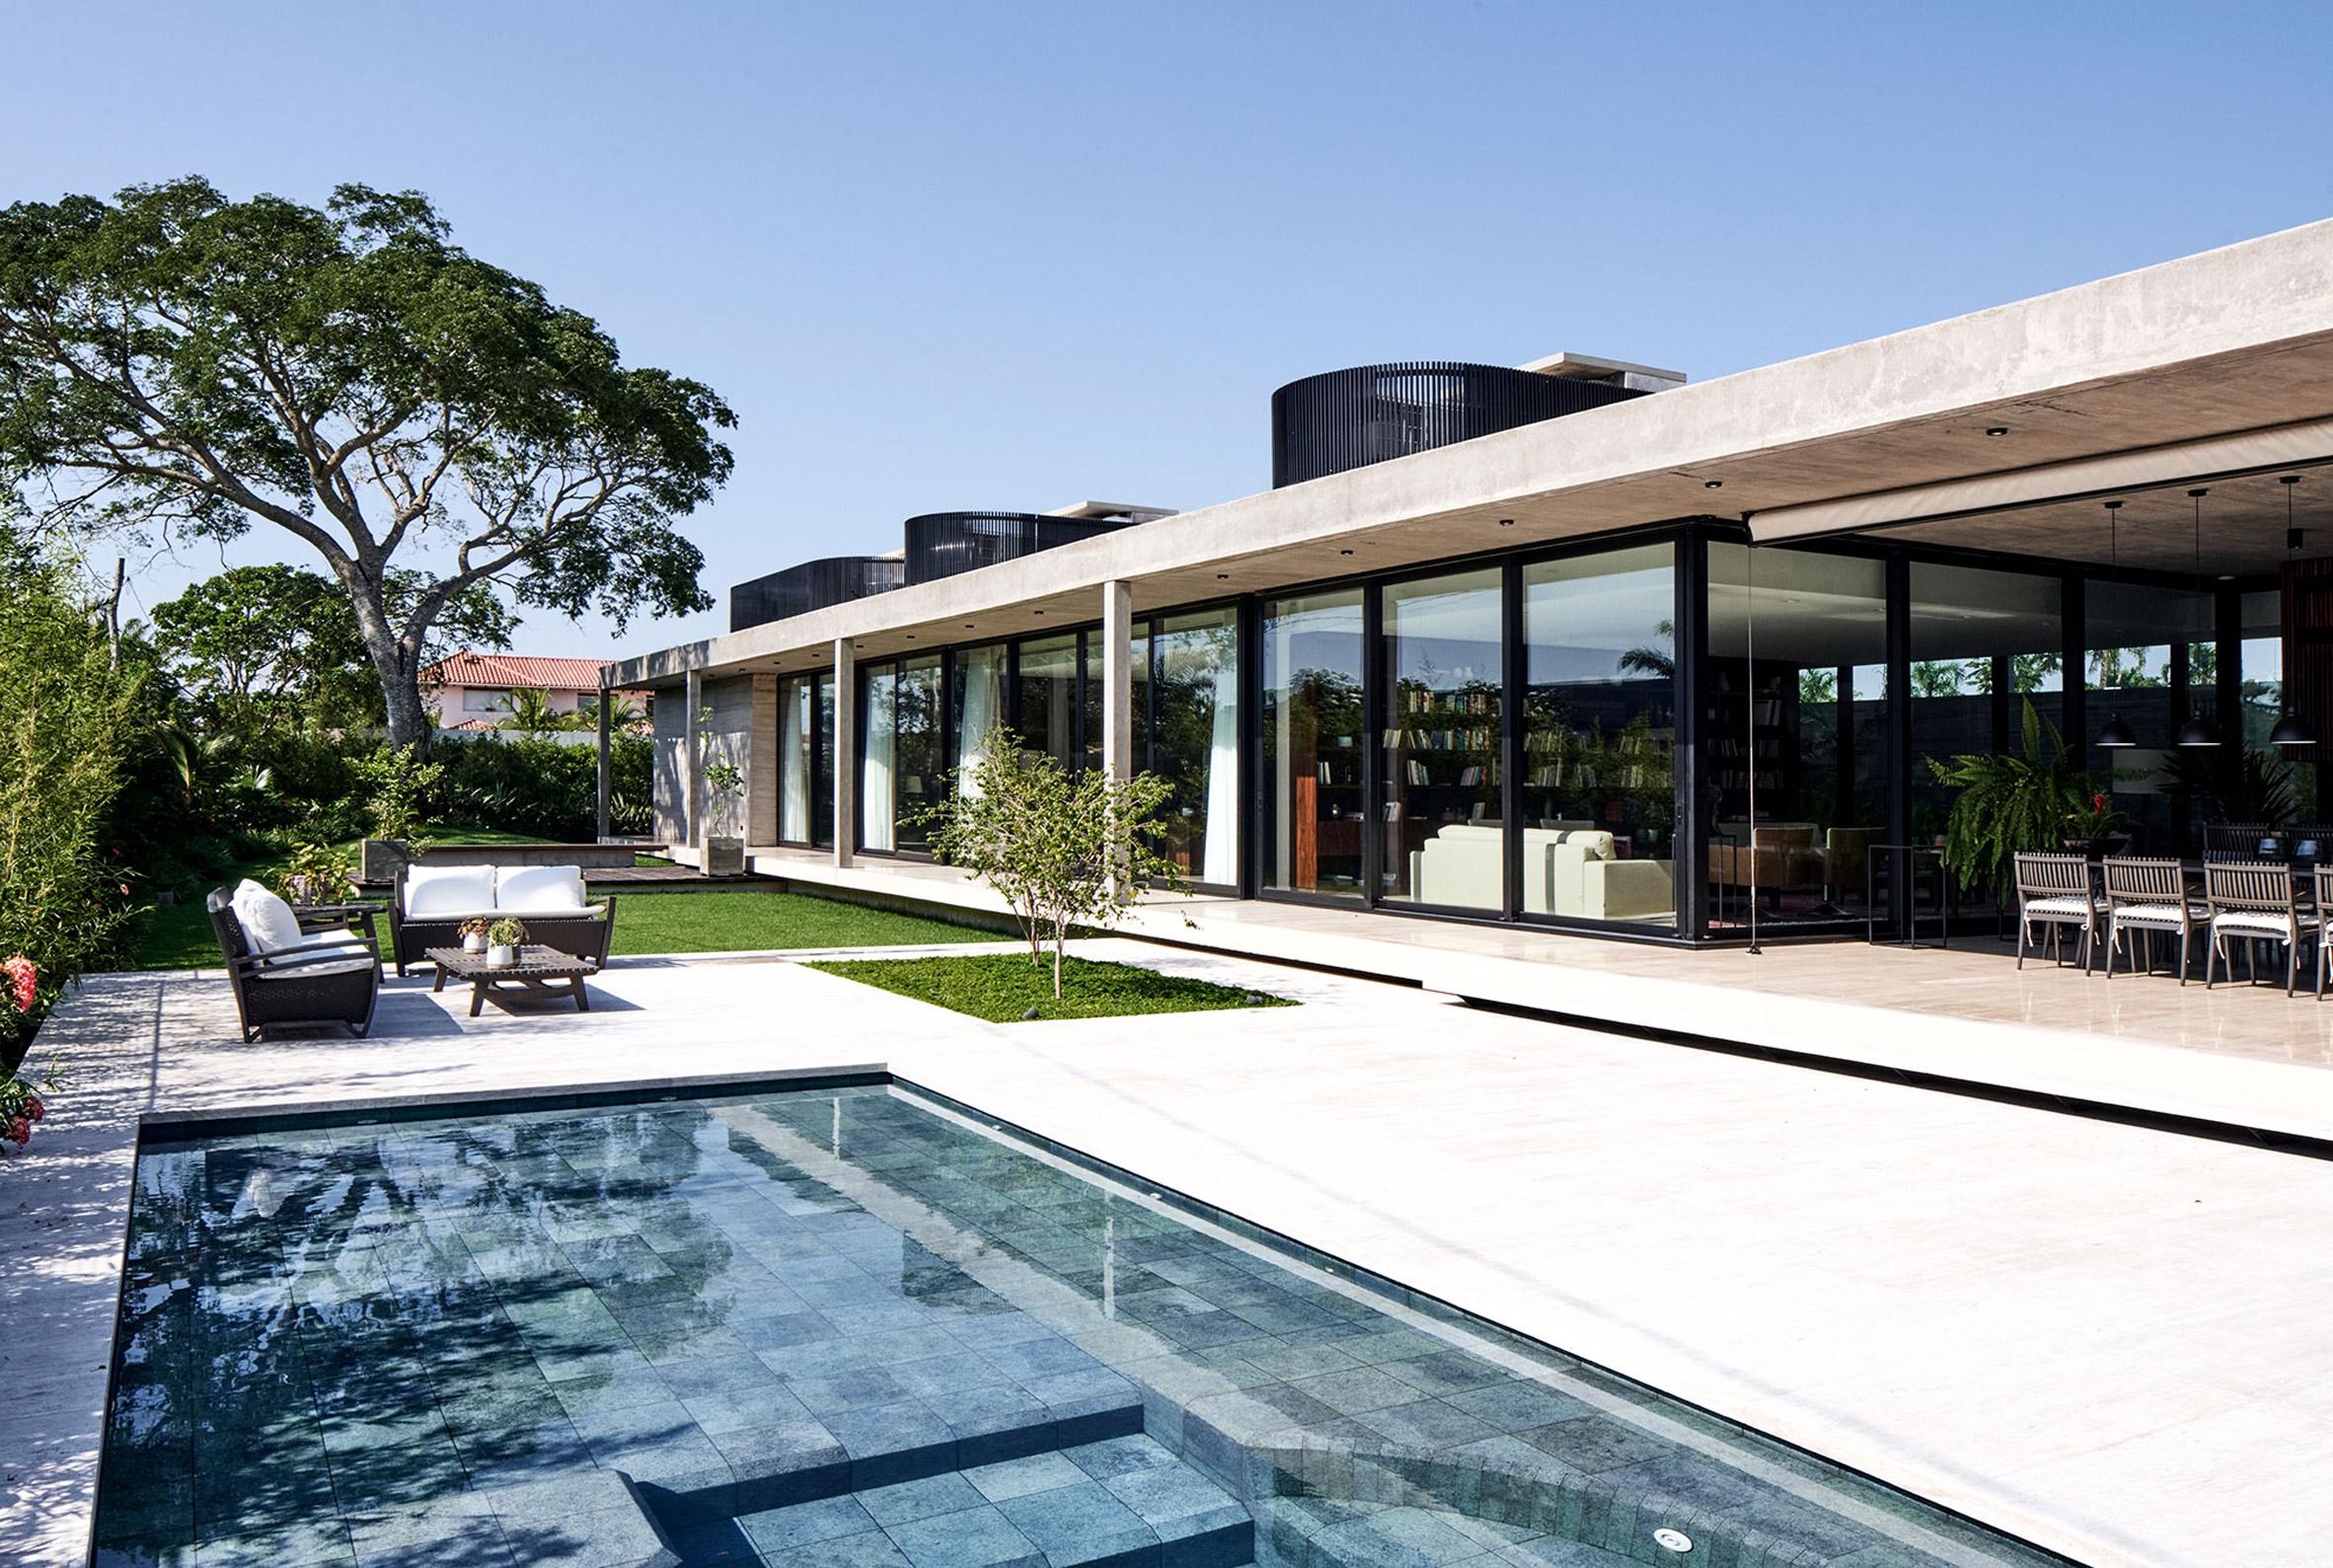 Casa 54 by Sommet